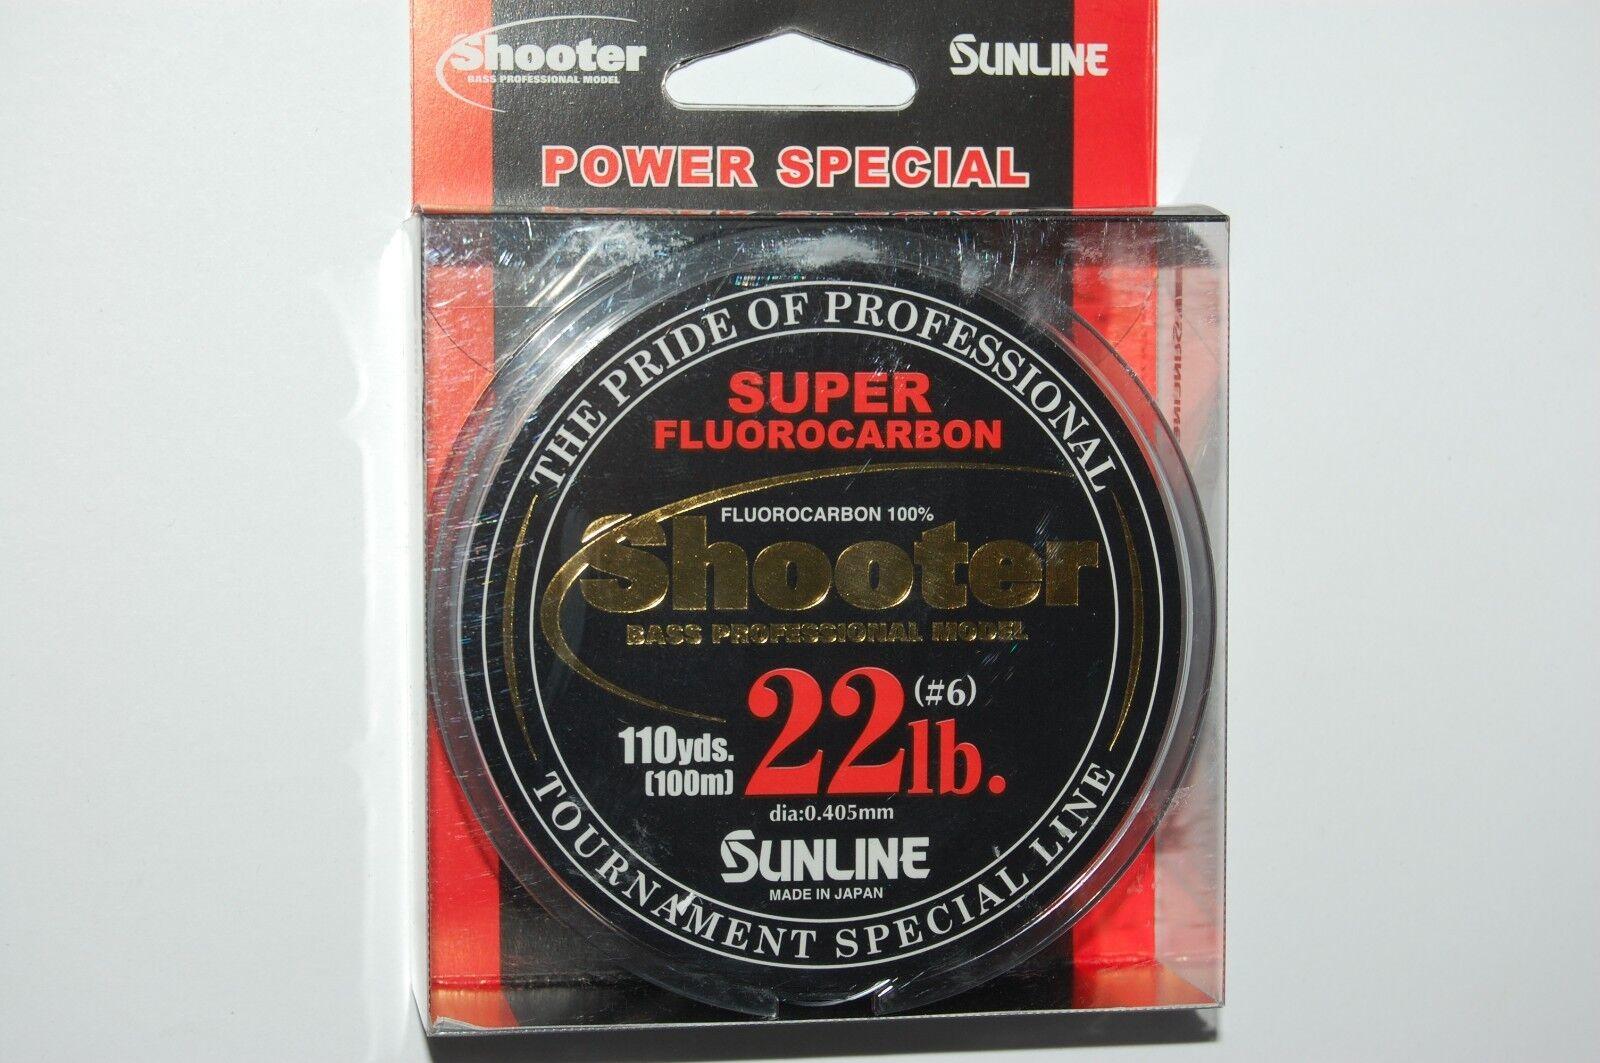 Sunline super 100% flugoldcarbon shooter 22lb clear 110yds spool fishing line